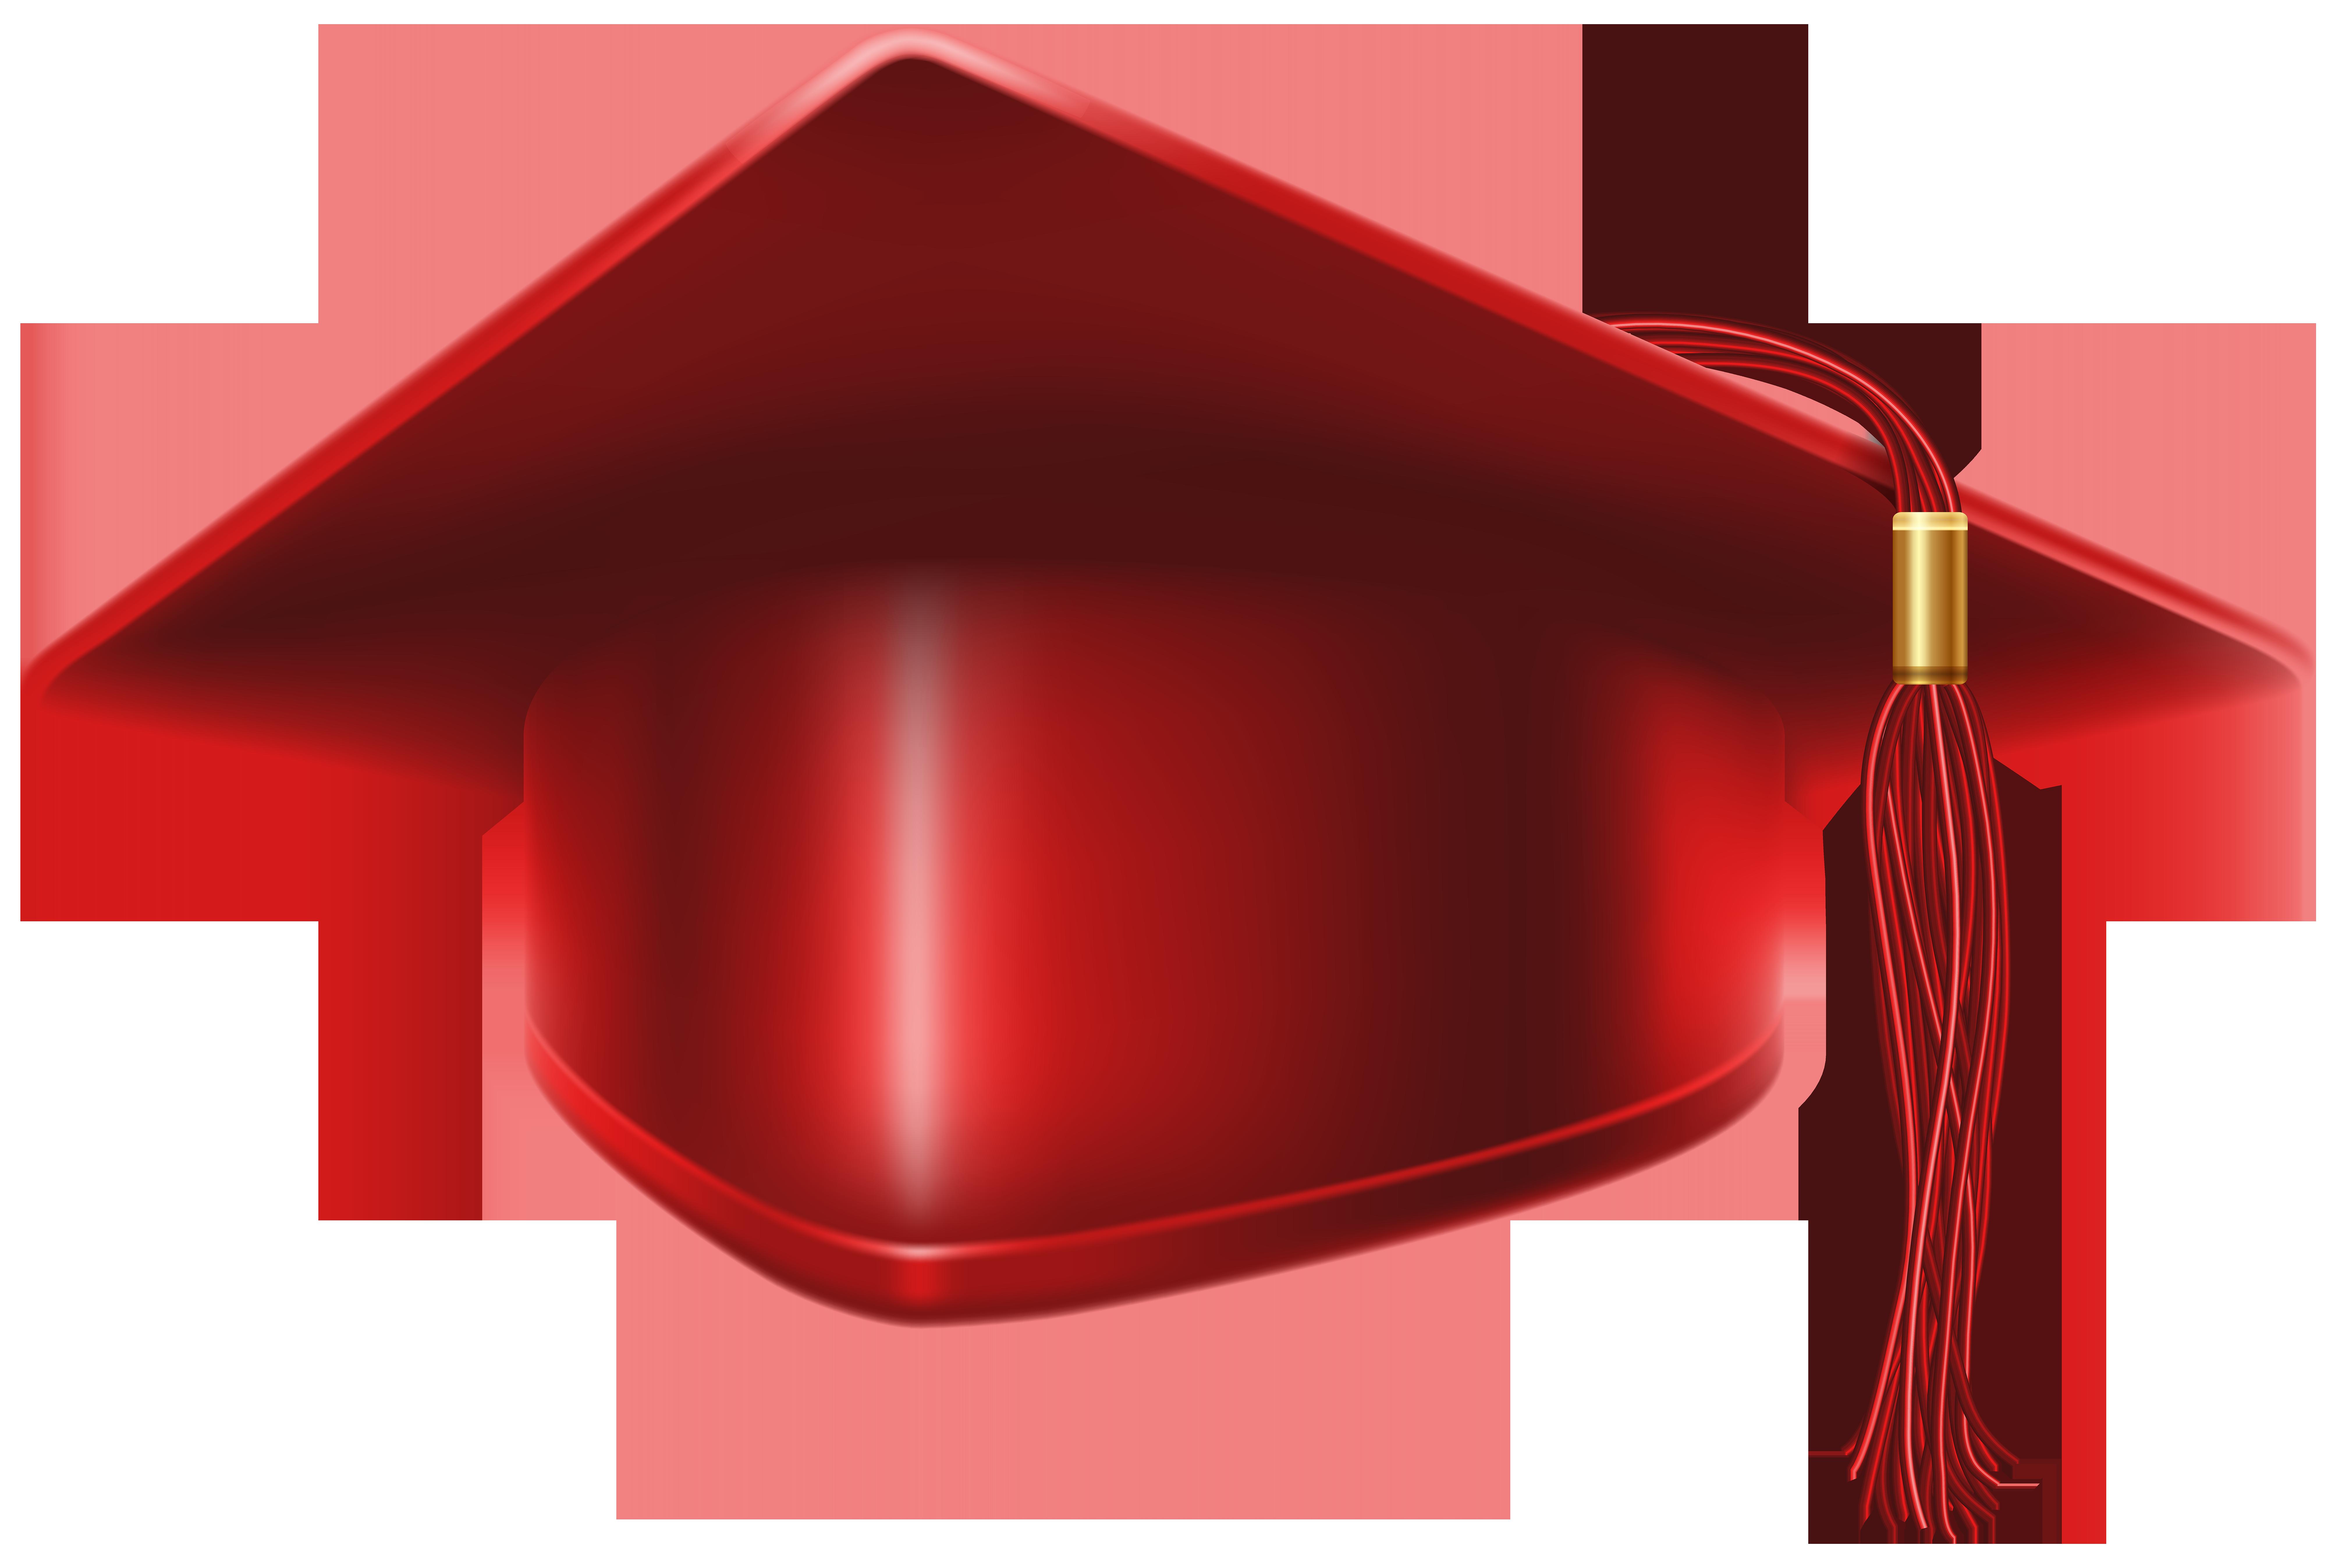 8000x5390 Graduation Cap And Gown Clip Art Image